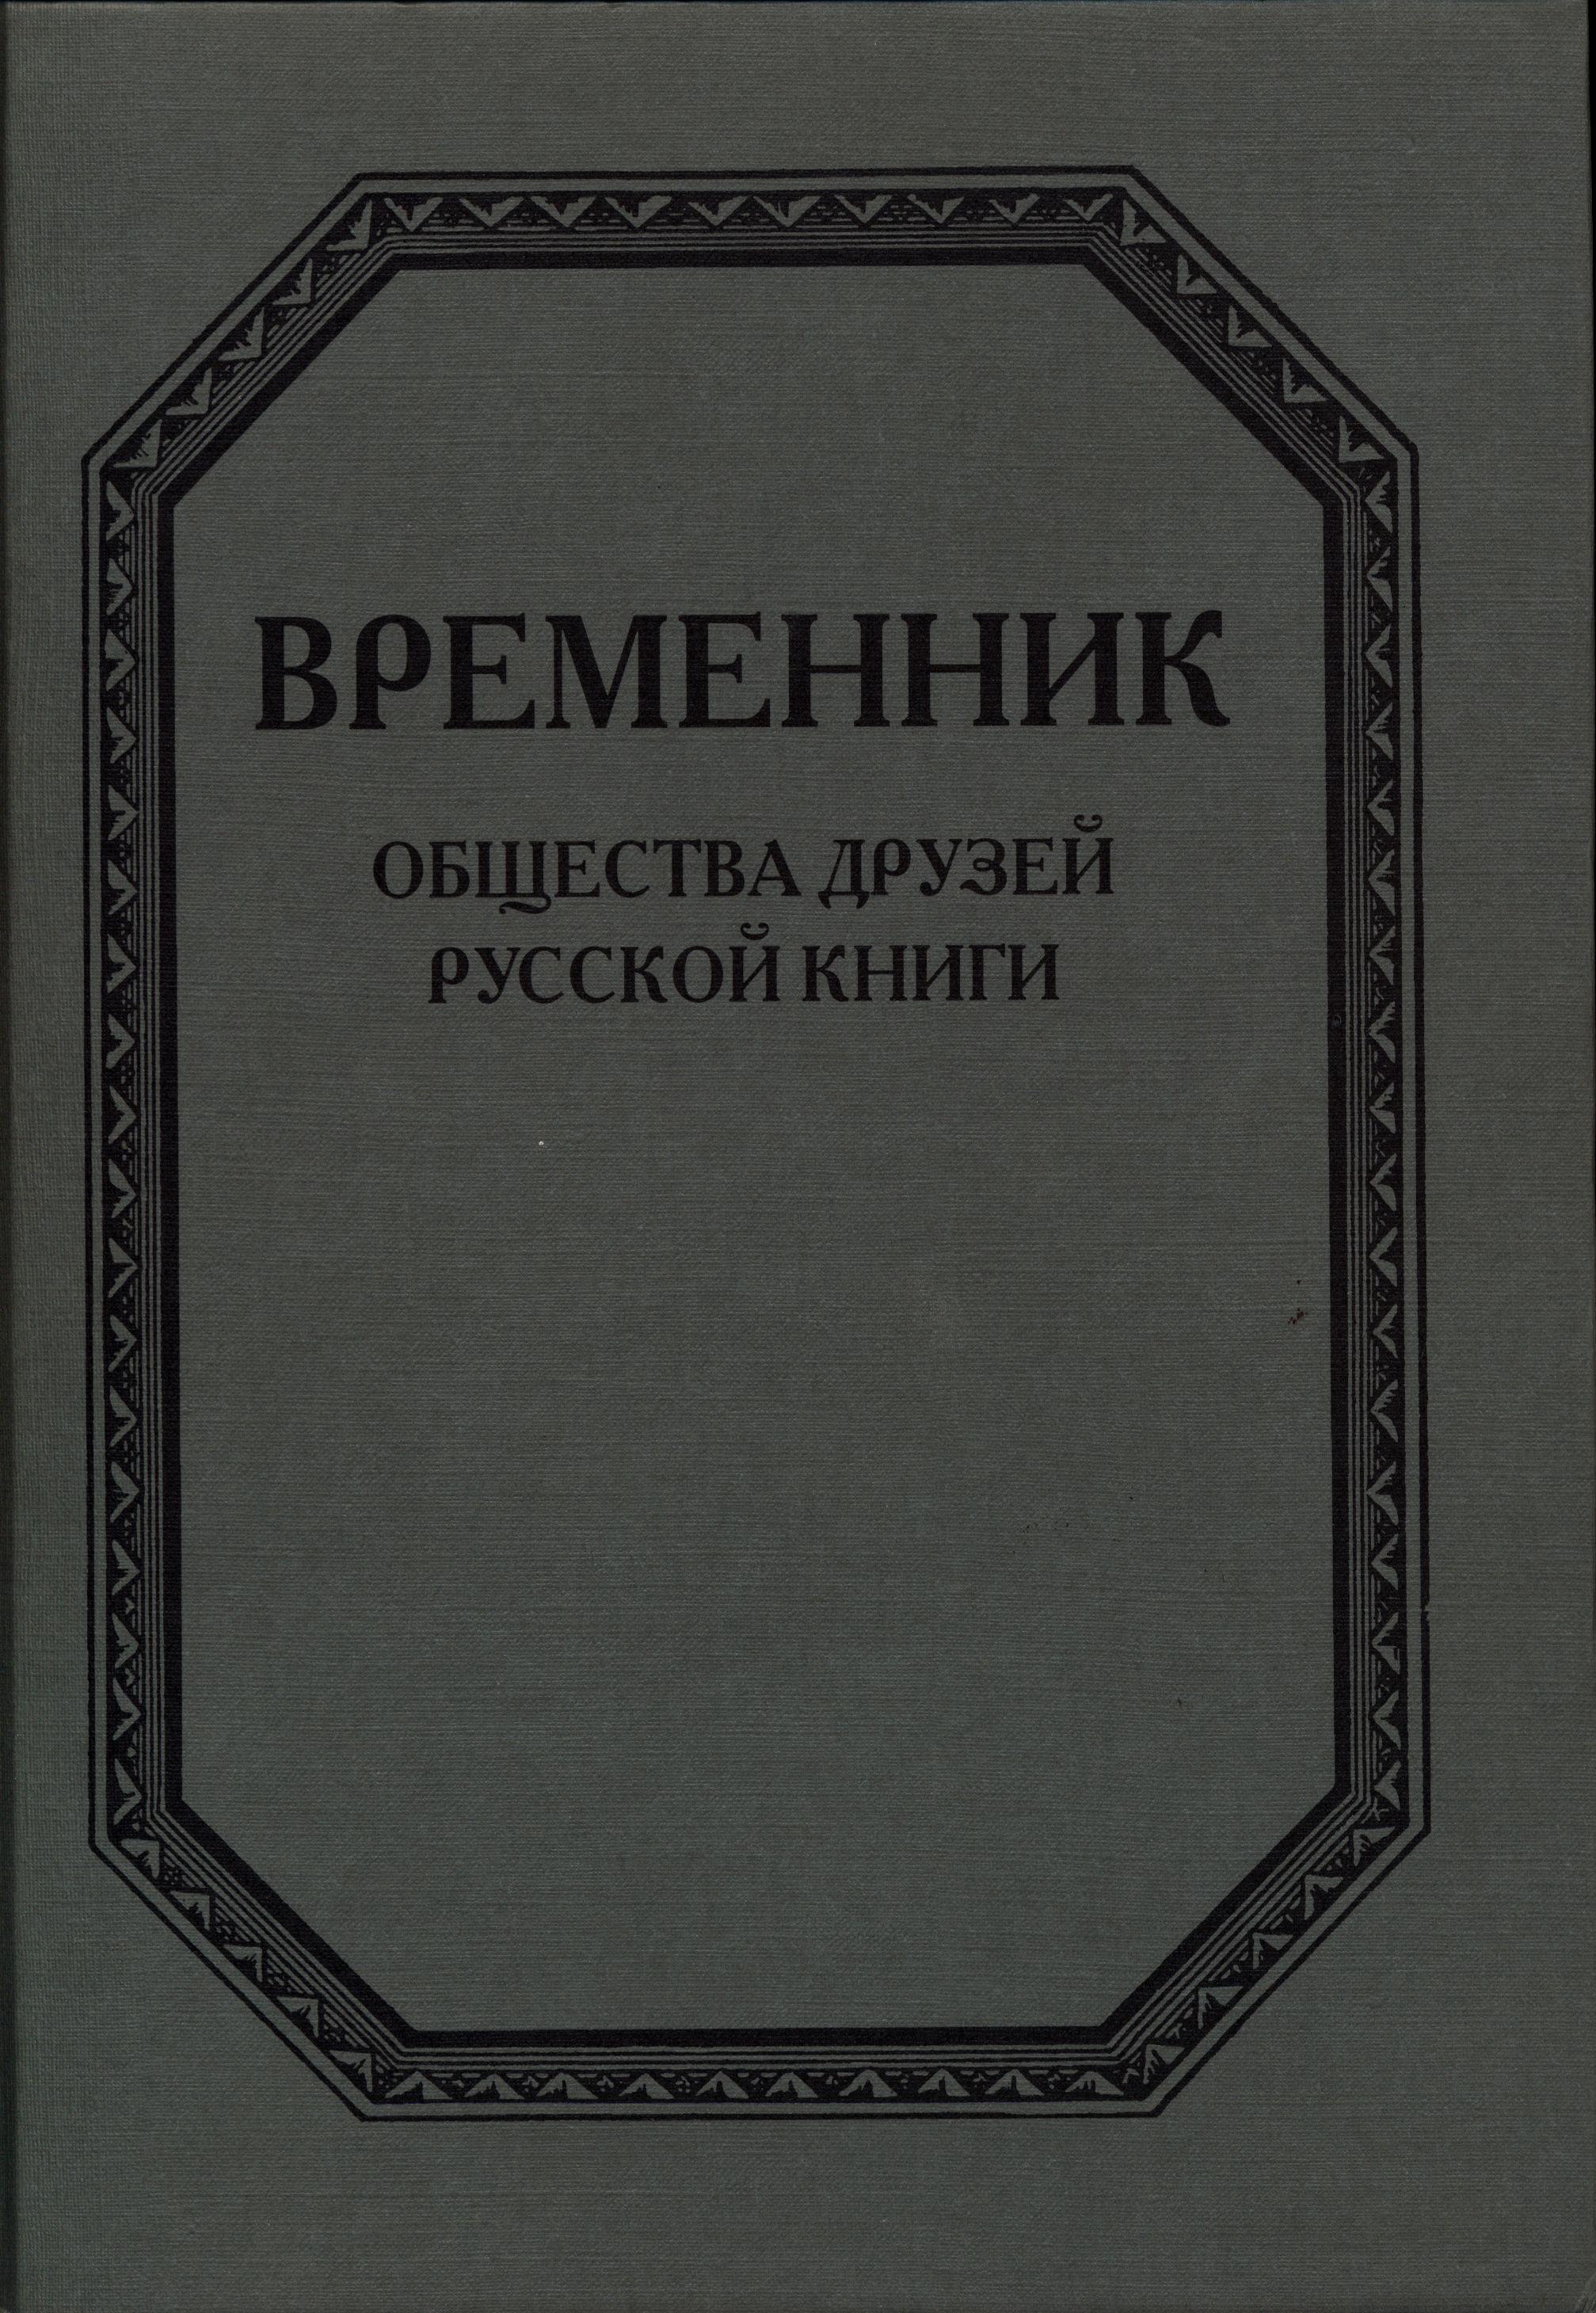 последний номер журнала знакомства в москве